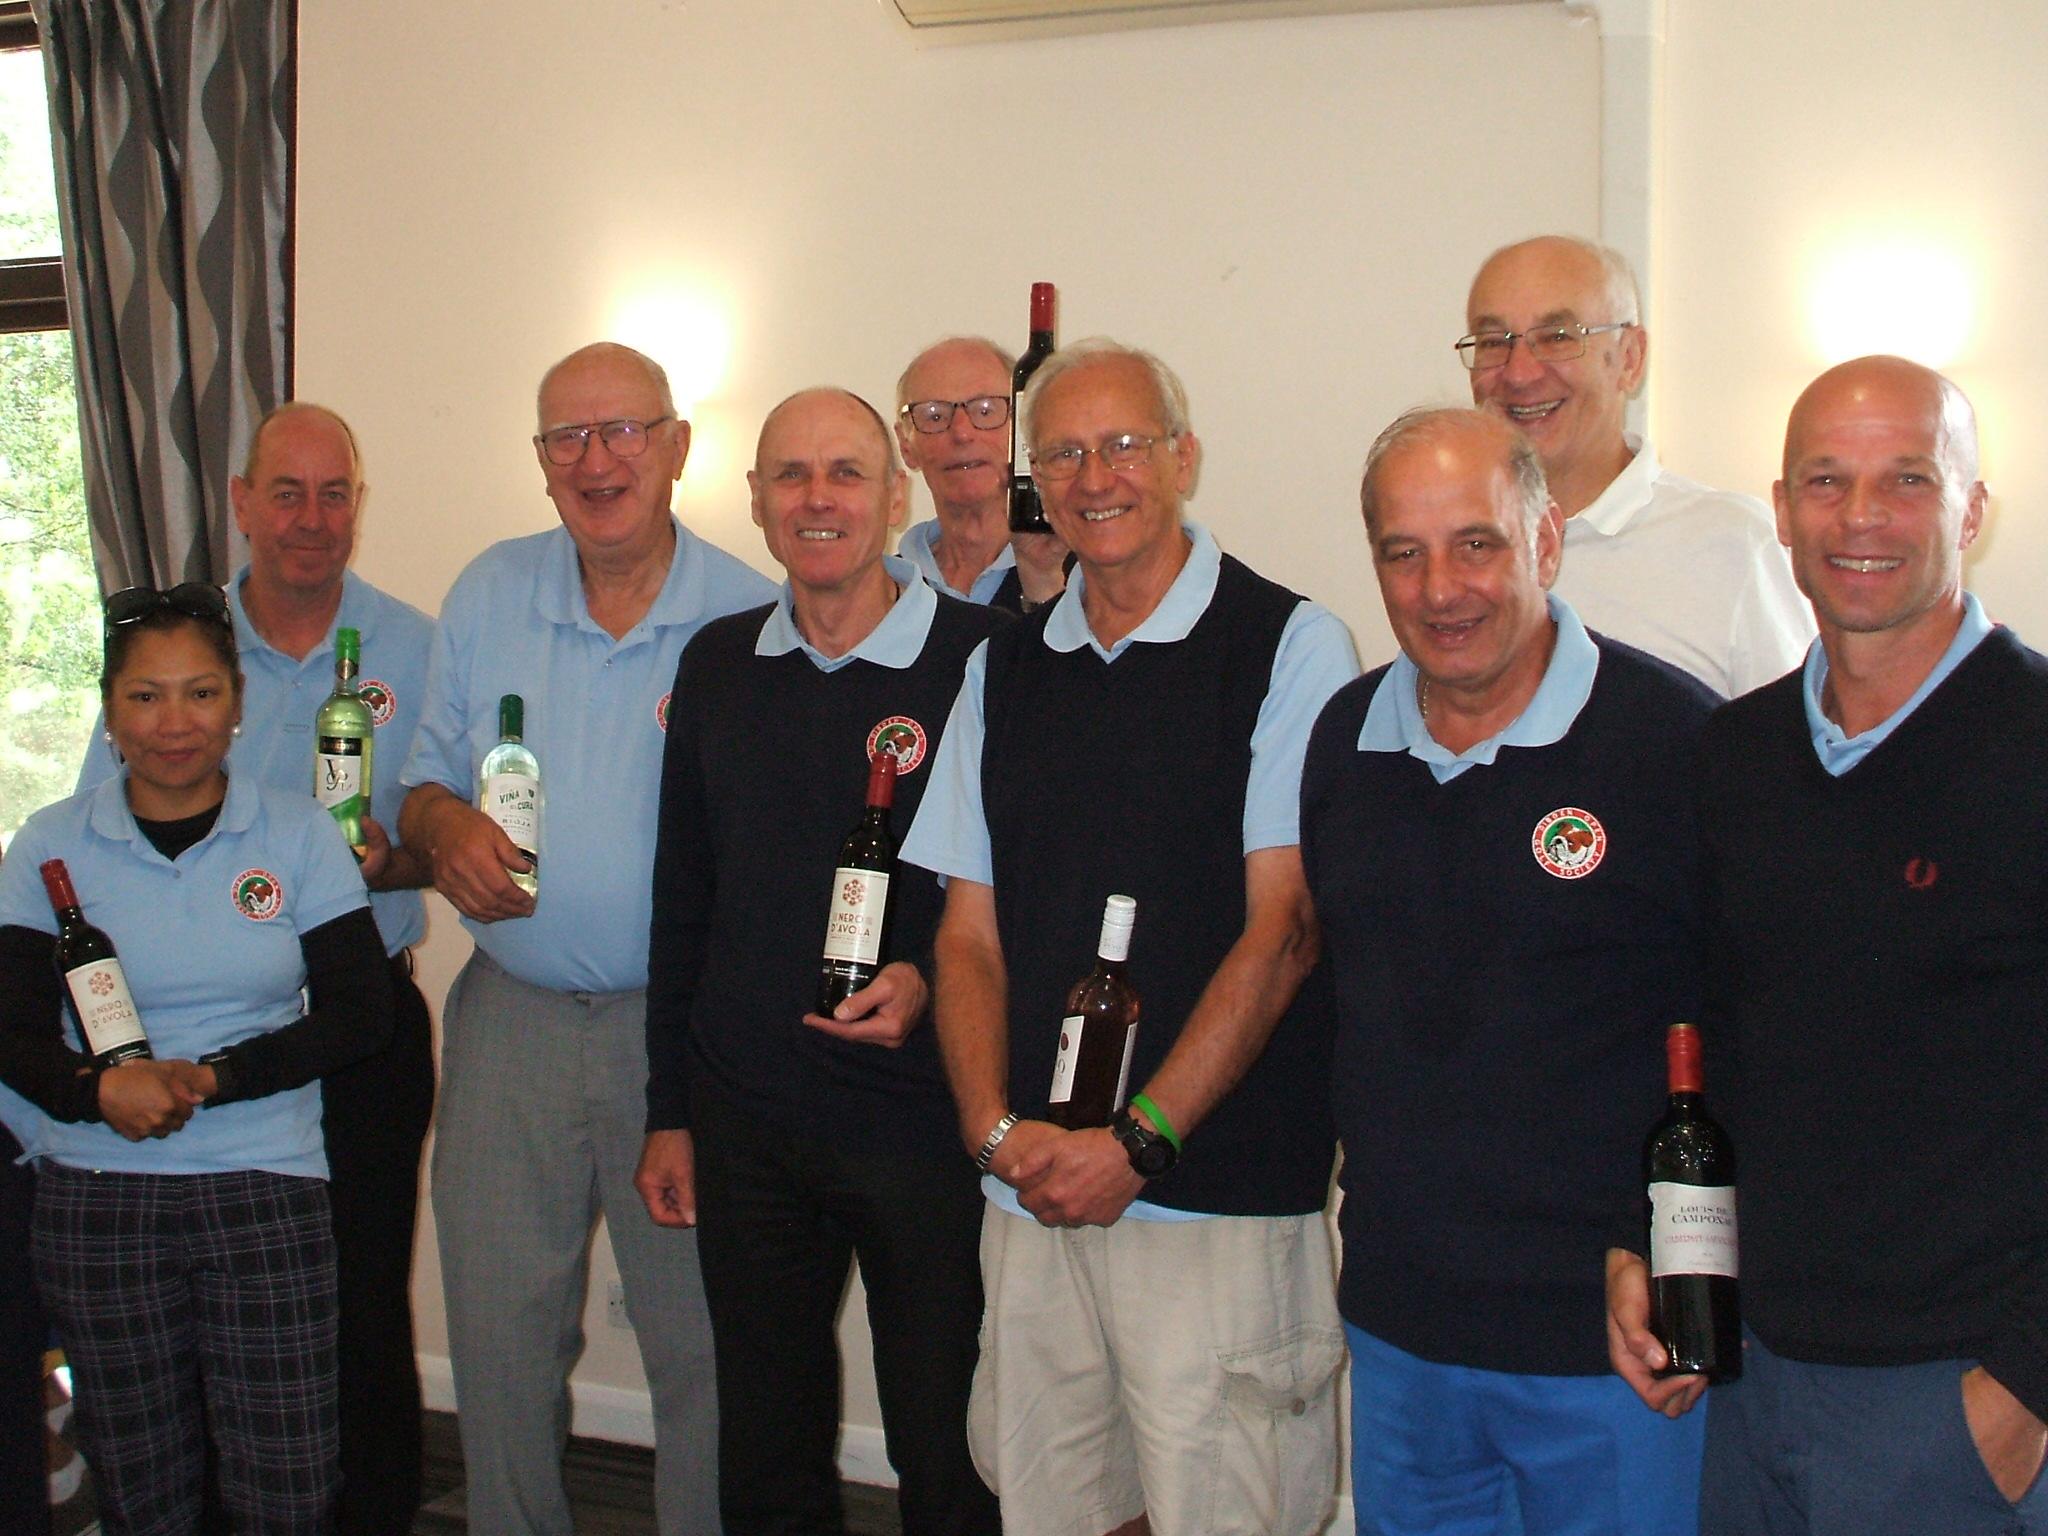 18 June: Wine Winners  l to r Jo Renyard; John Slade; Bob Phillips; Paul Wastell; Peter Dent; Ron Gooding; Colin Viney; Brian Cox; Paul Pallister